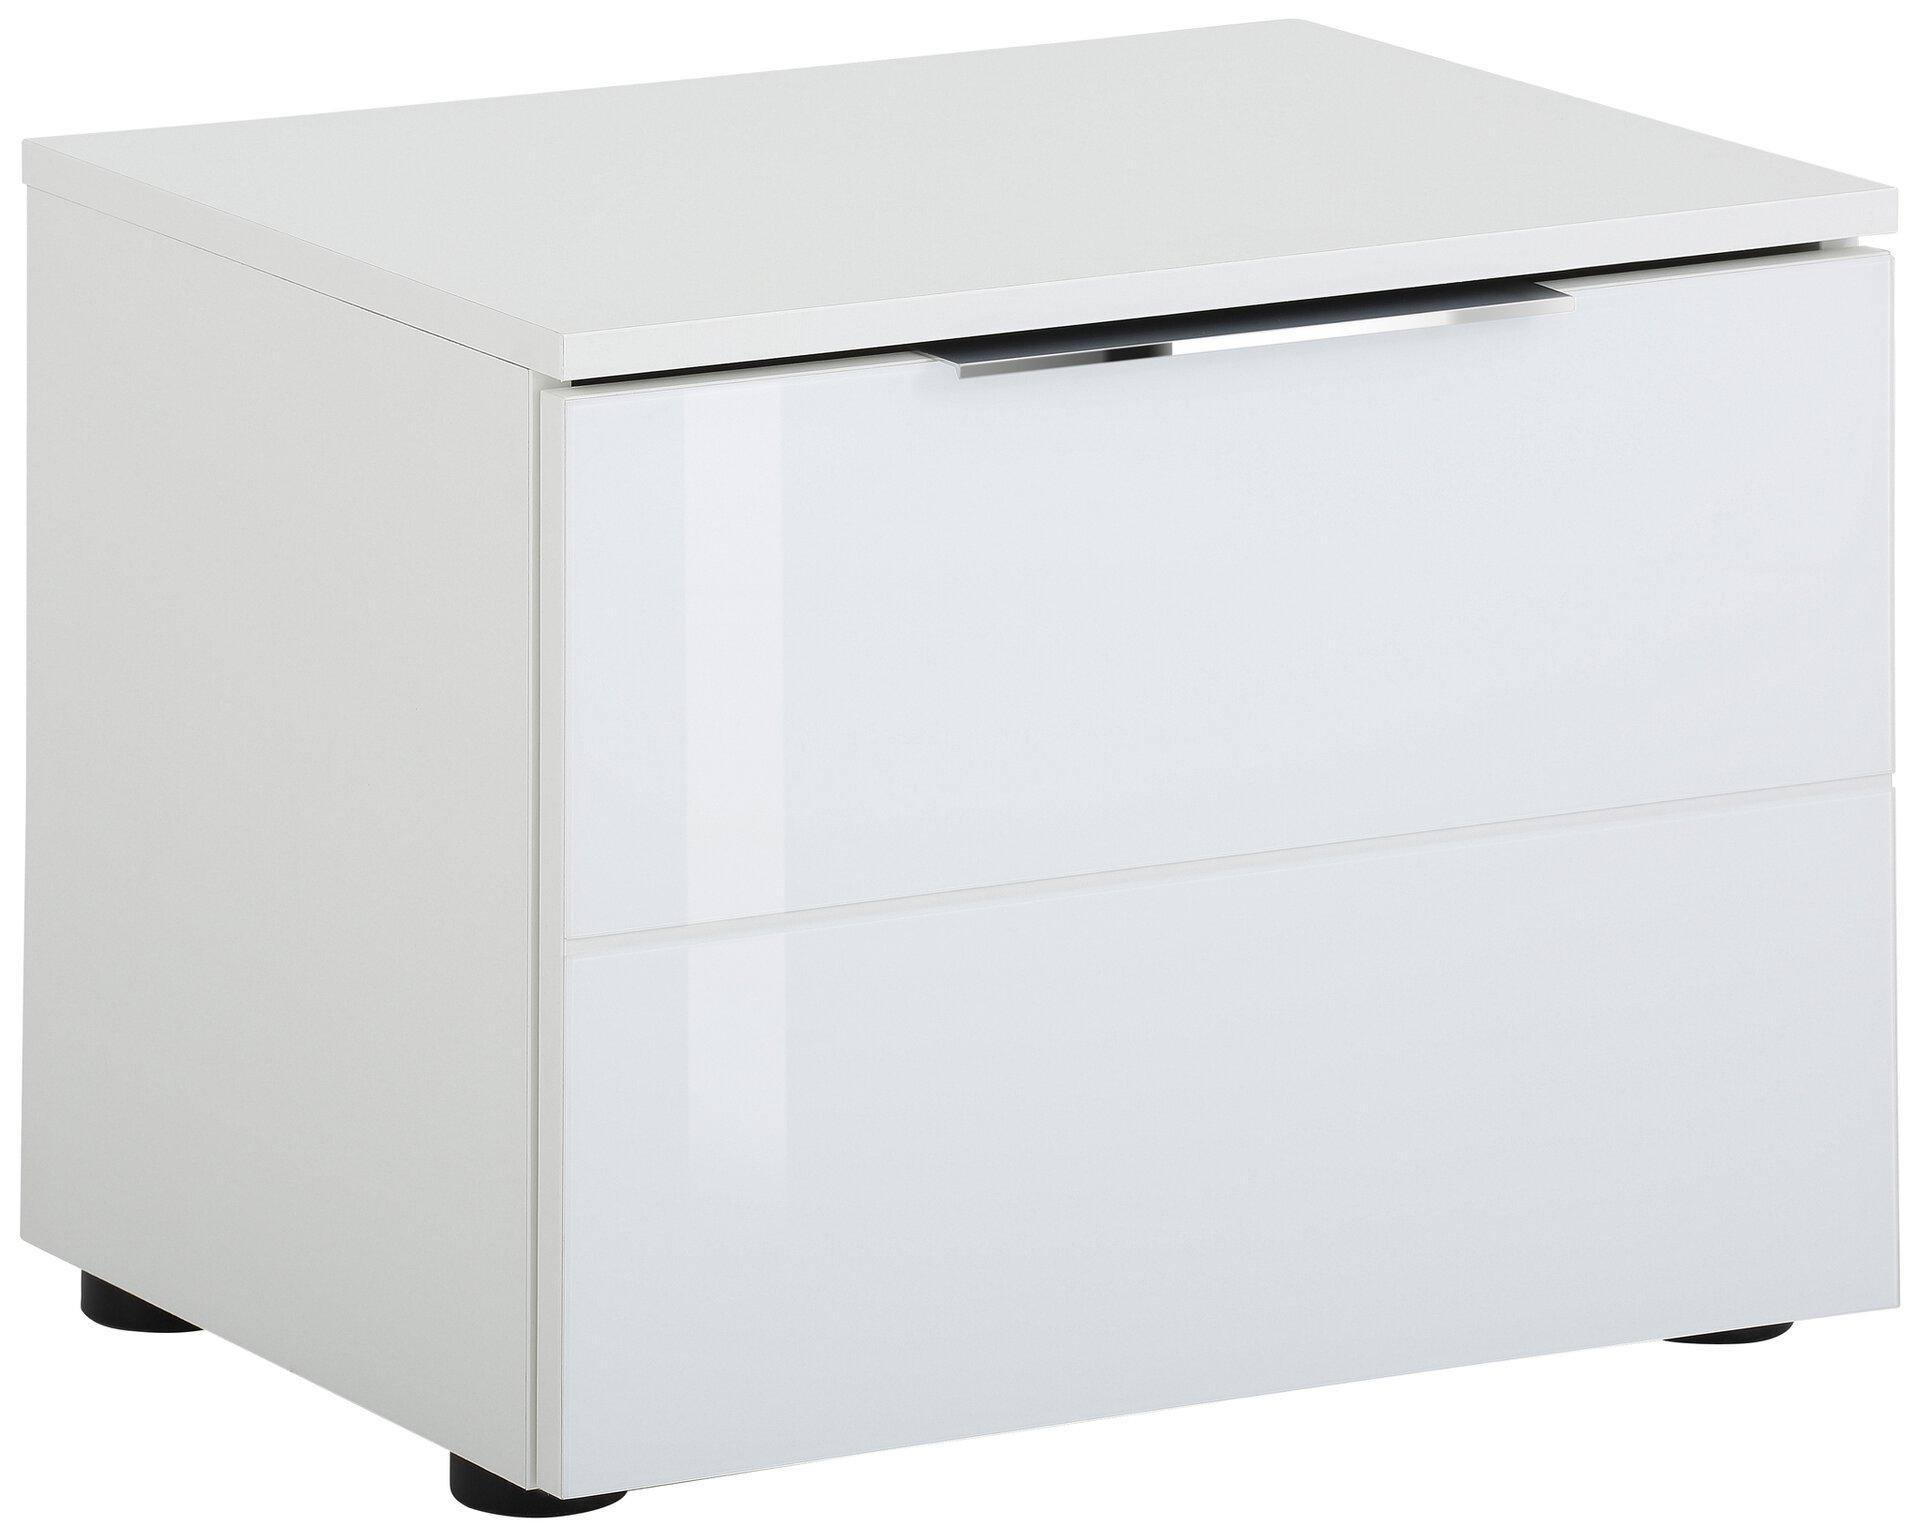 Garderobenbank SWAG Vito Holzwerkstoff weiß 37 x 39 x 49 cm